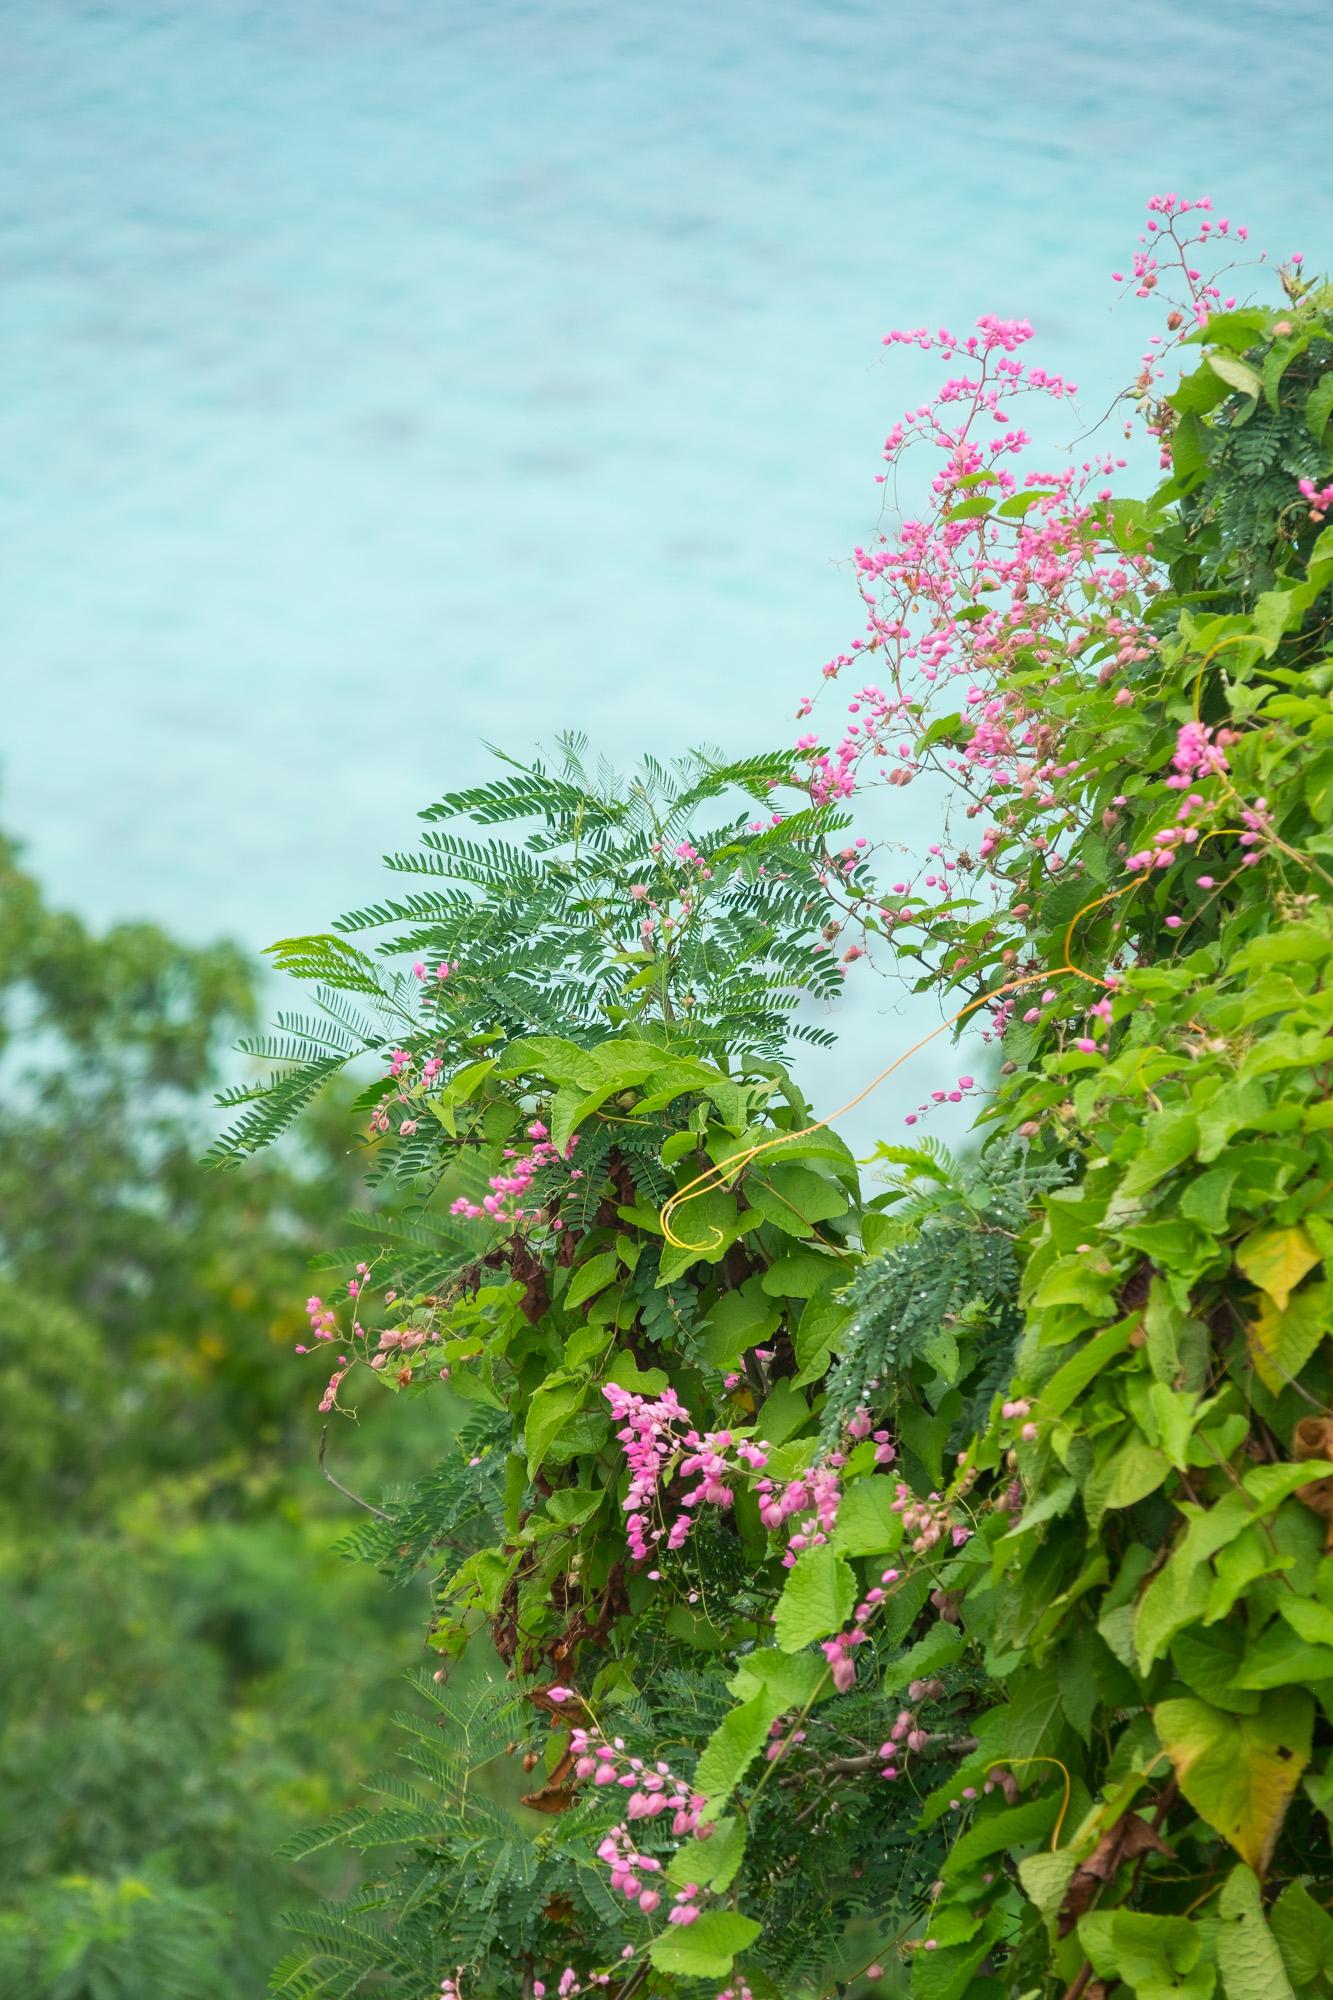 Pretty flowers against the aquamarine sea.